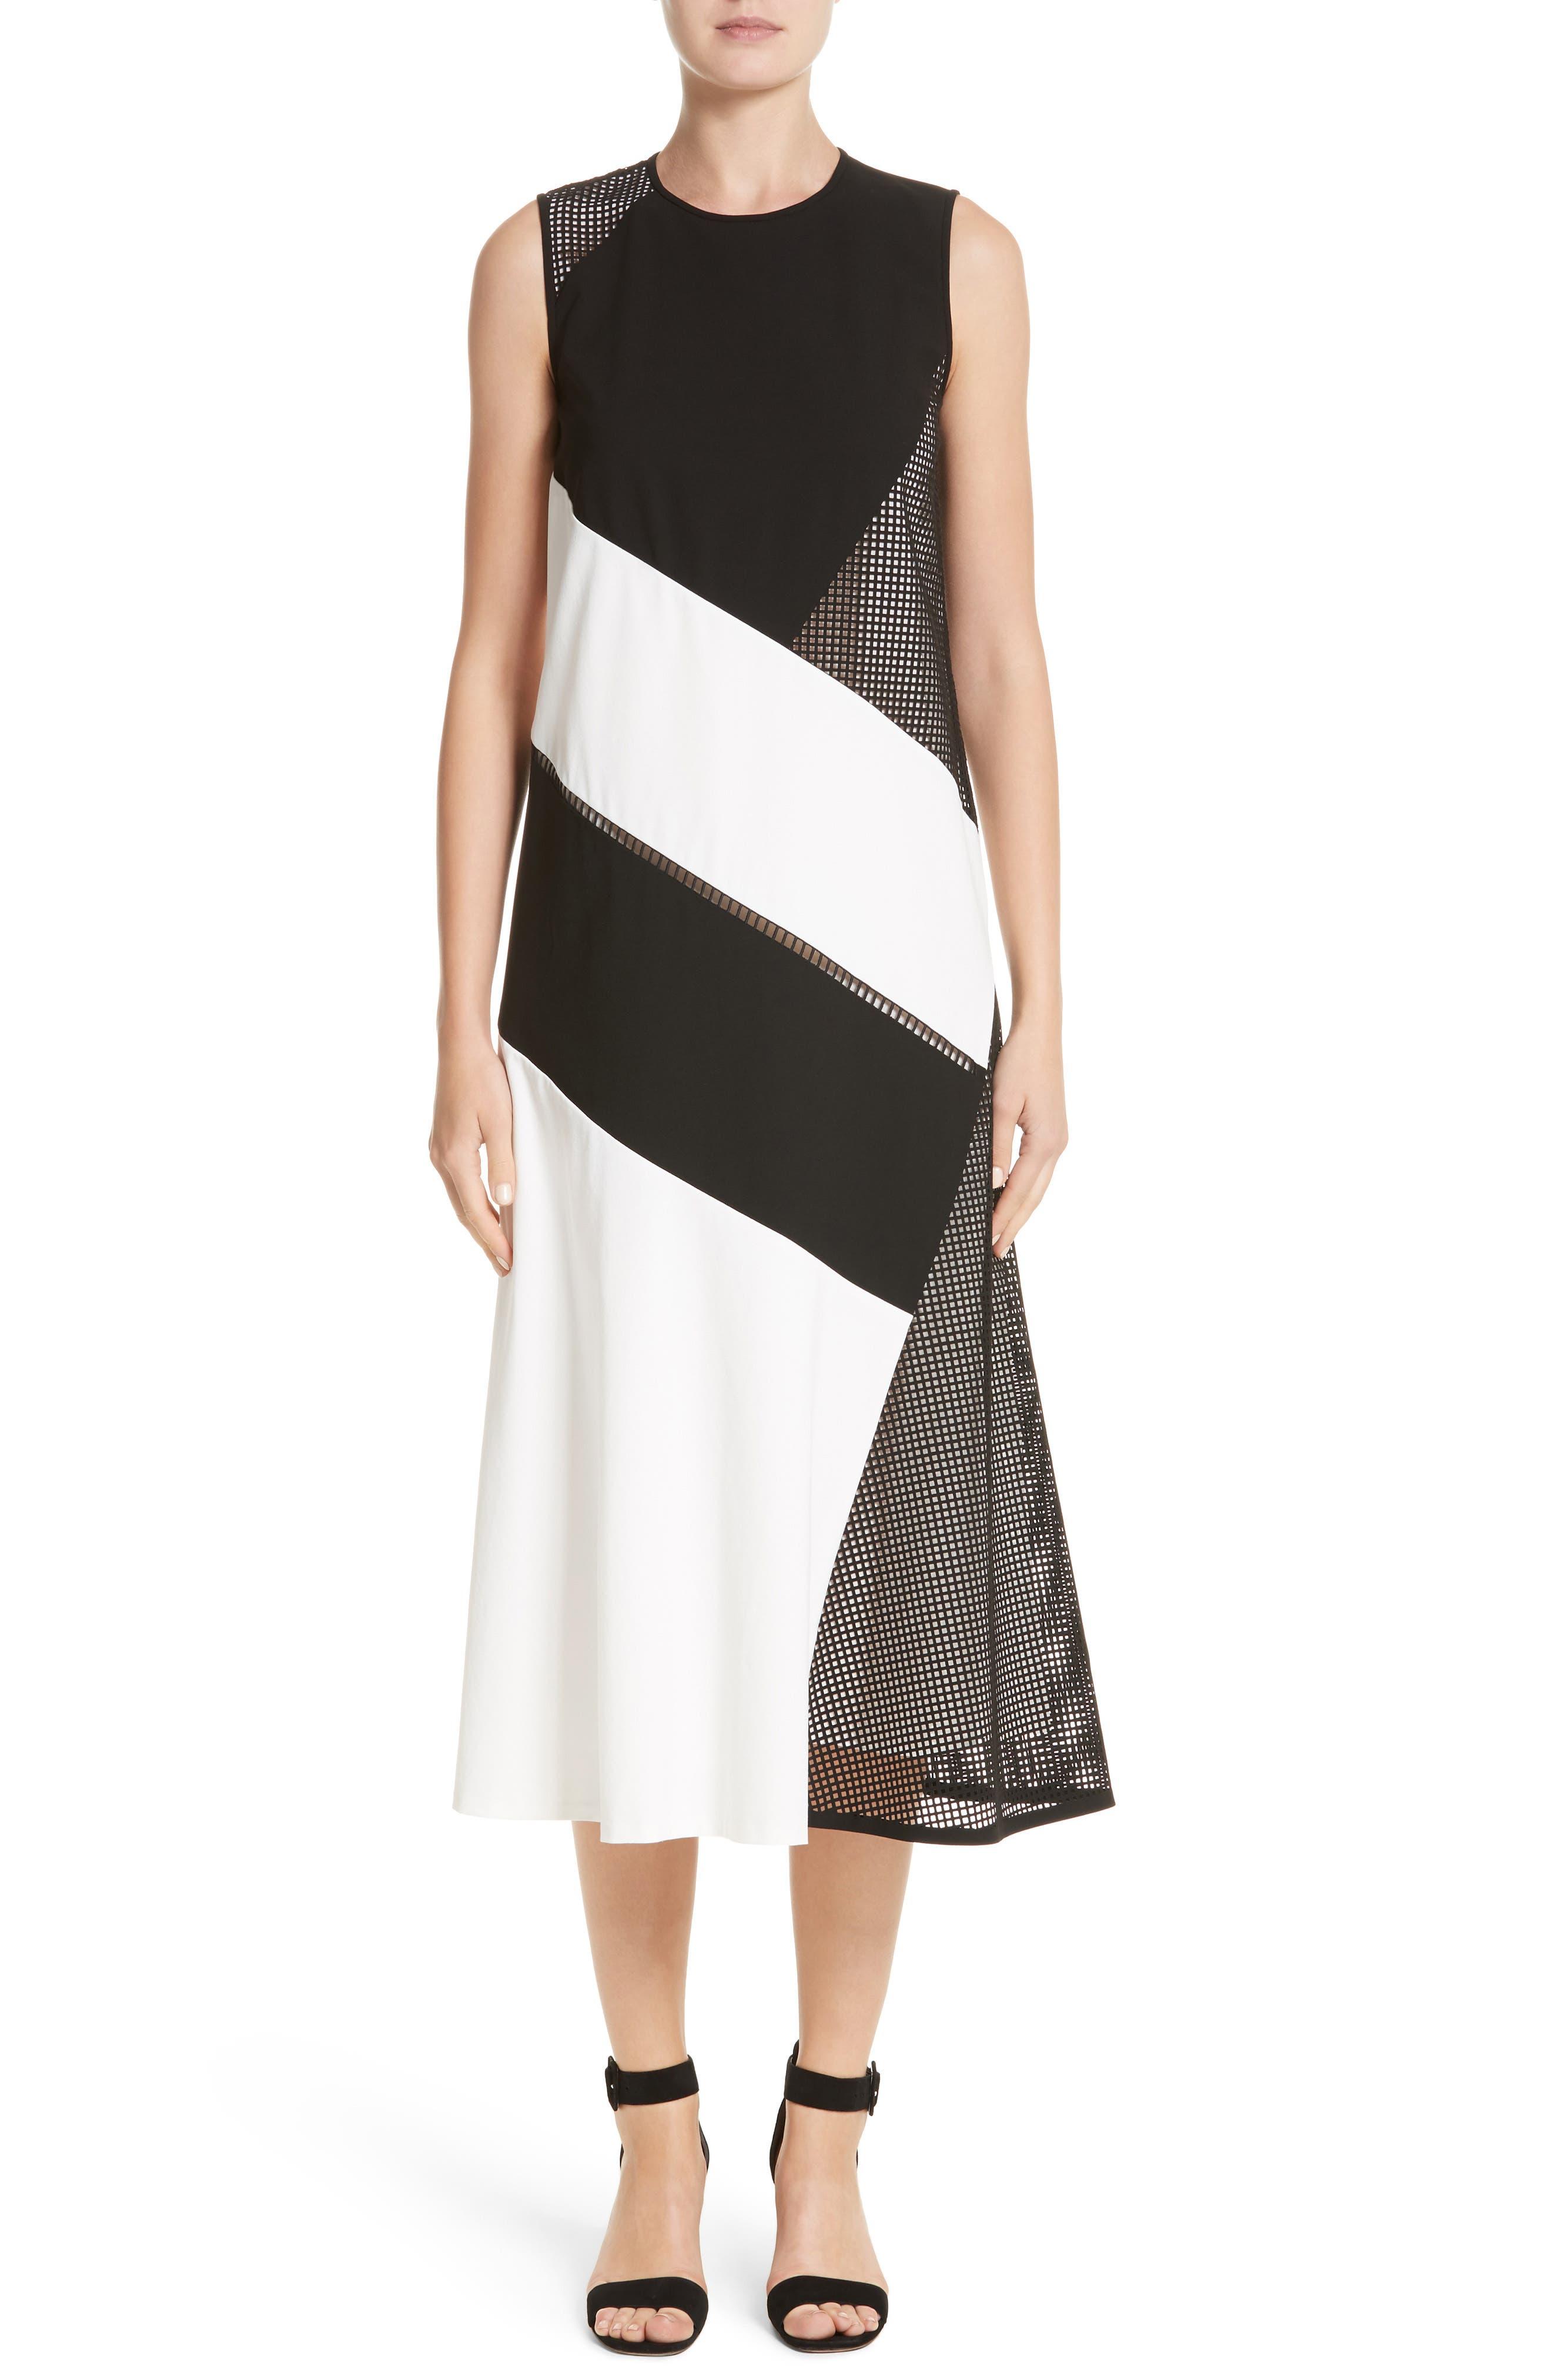 Nuri Laser Cut Midi Dress,                             Main thumbnail 1, color,                             Black/Cloud